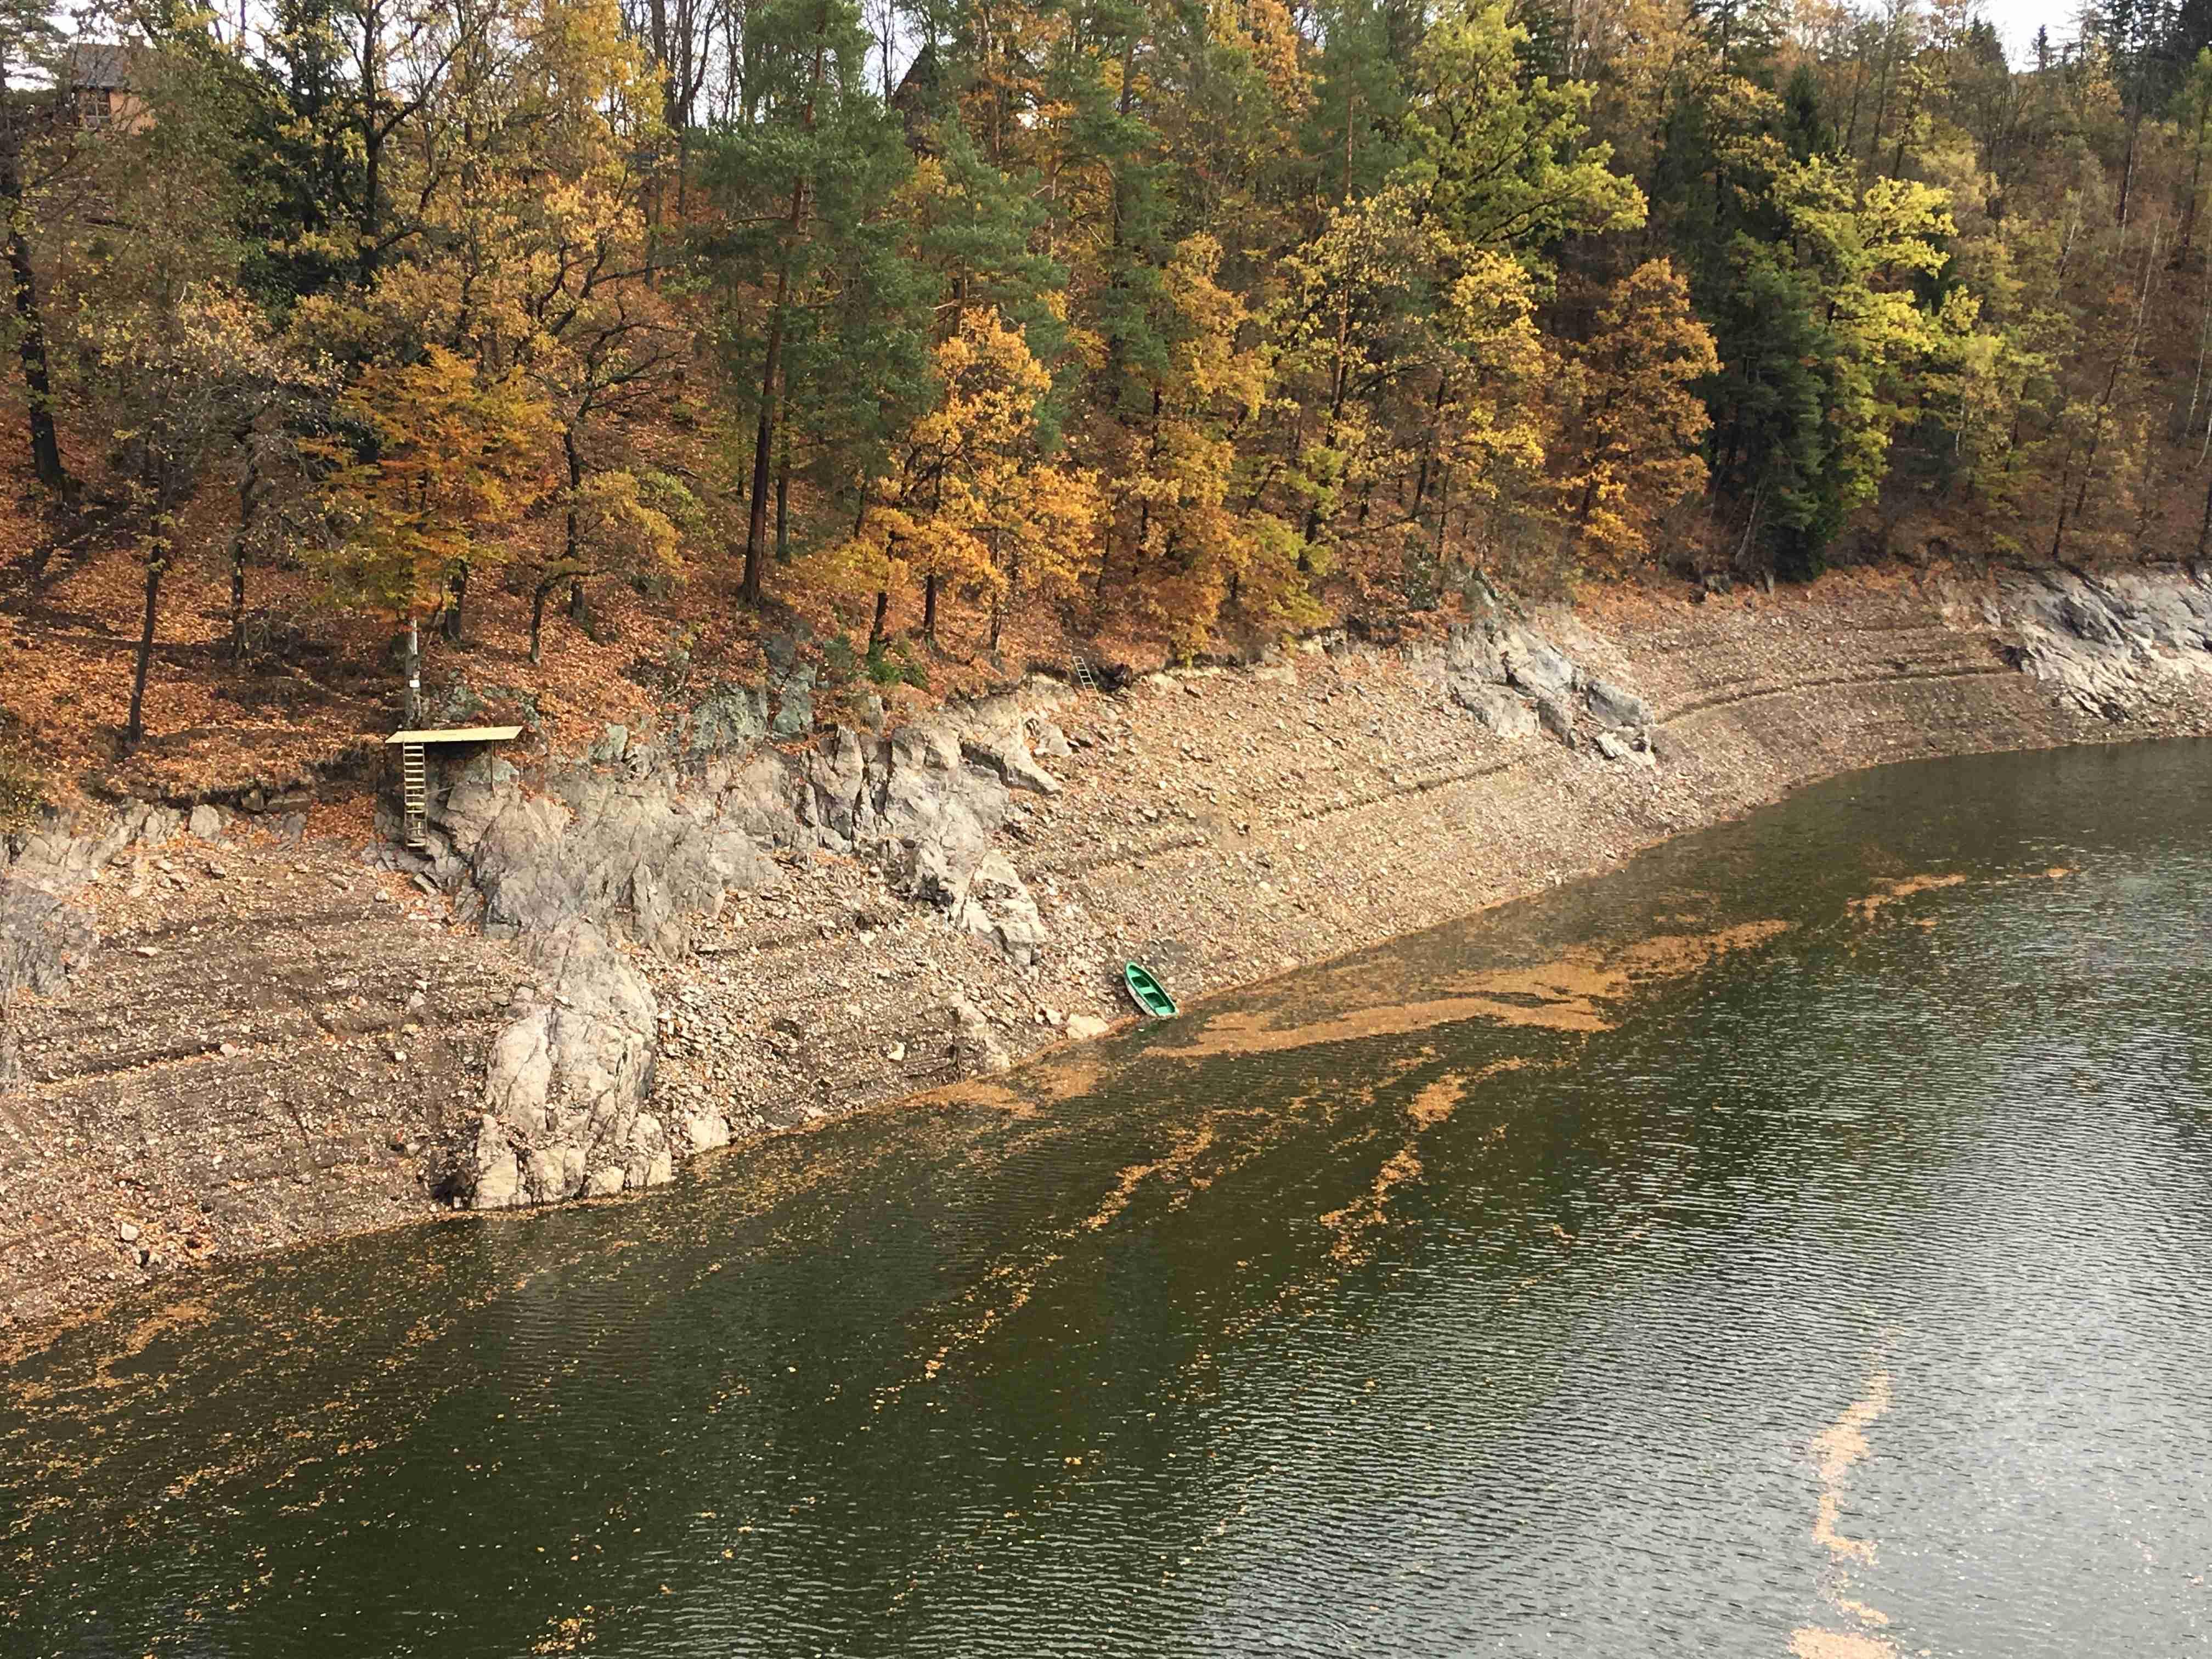 Vody je na Pastvinách málo, protože se nadlepšoval tok Divoké Orlice.